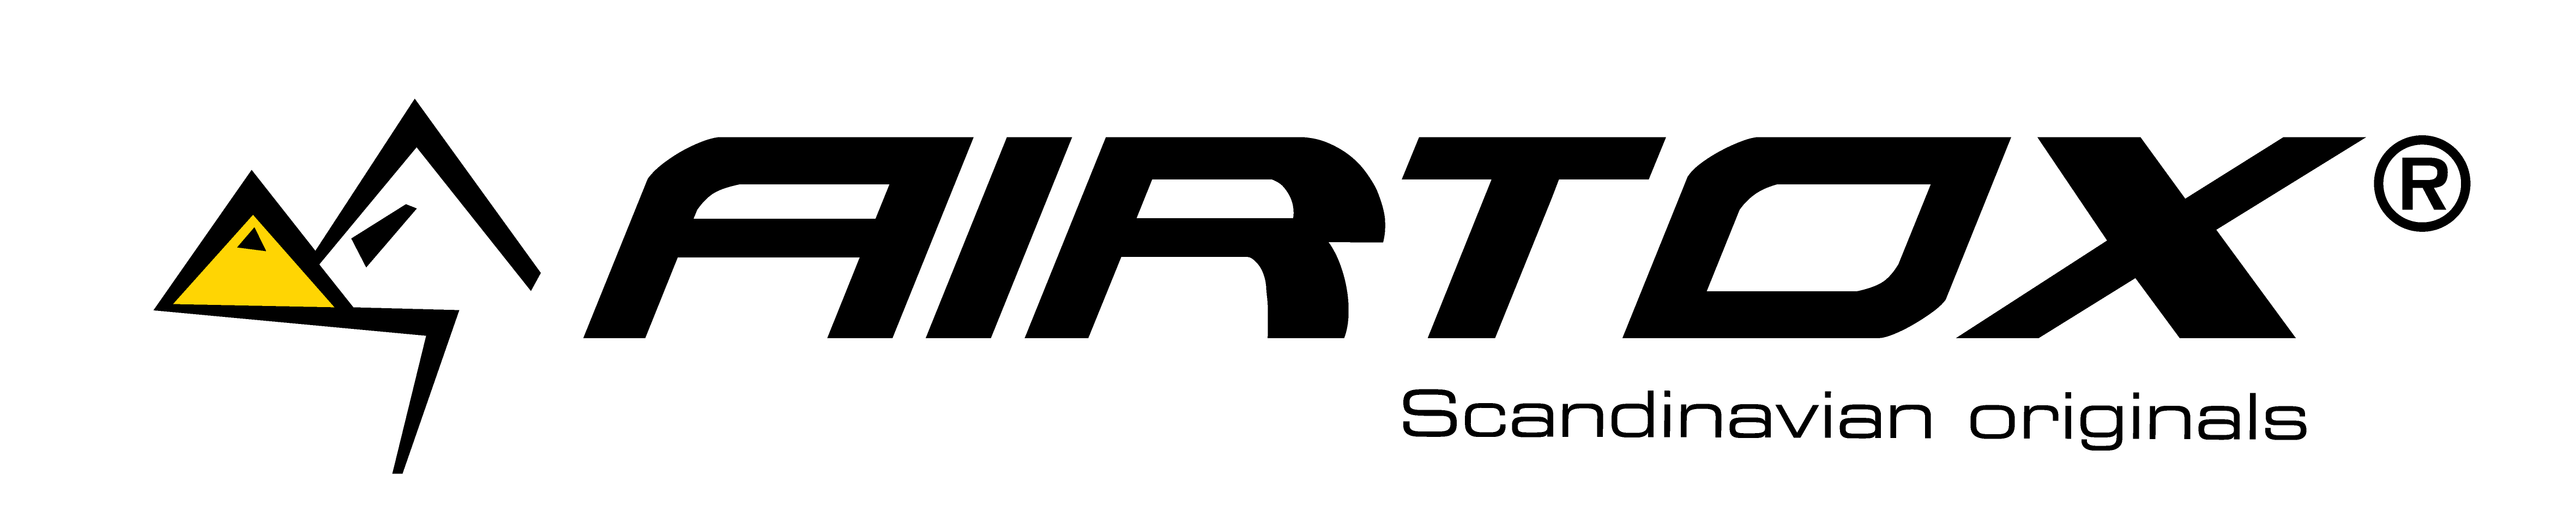 airtox _NEW_text-bird_logo_black_3